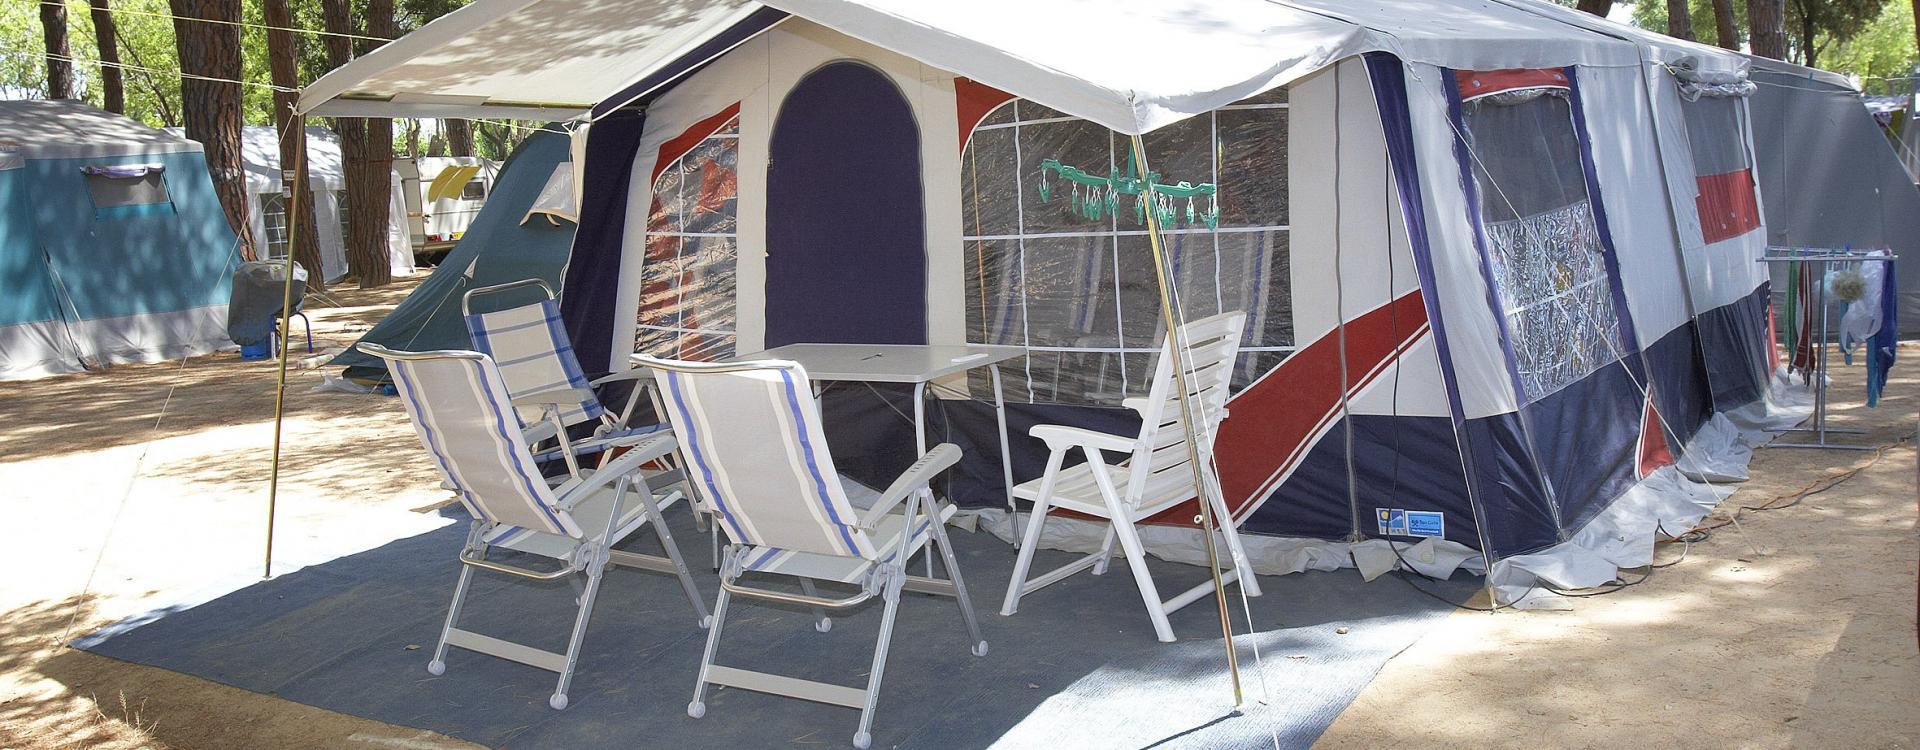 Tente installée au Camping Valldaro